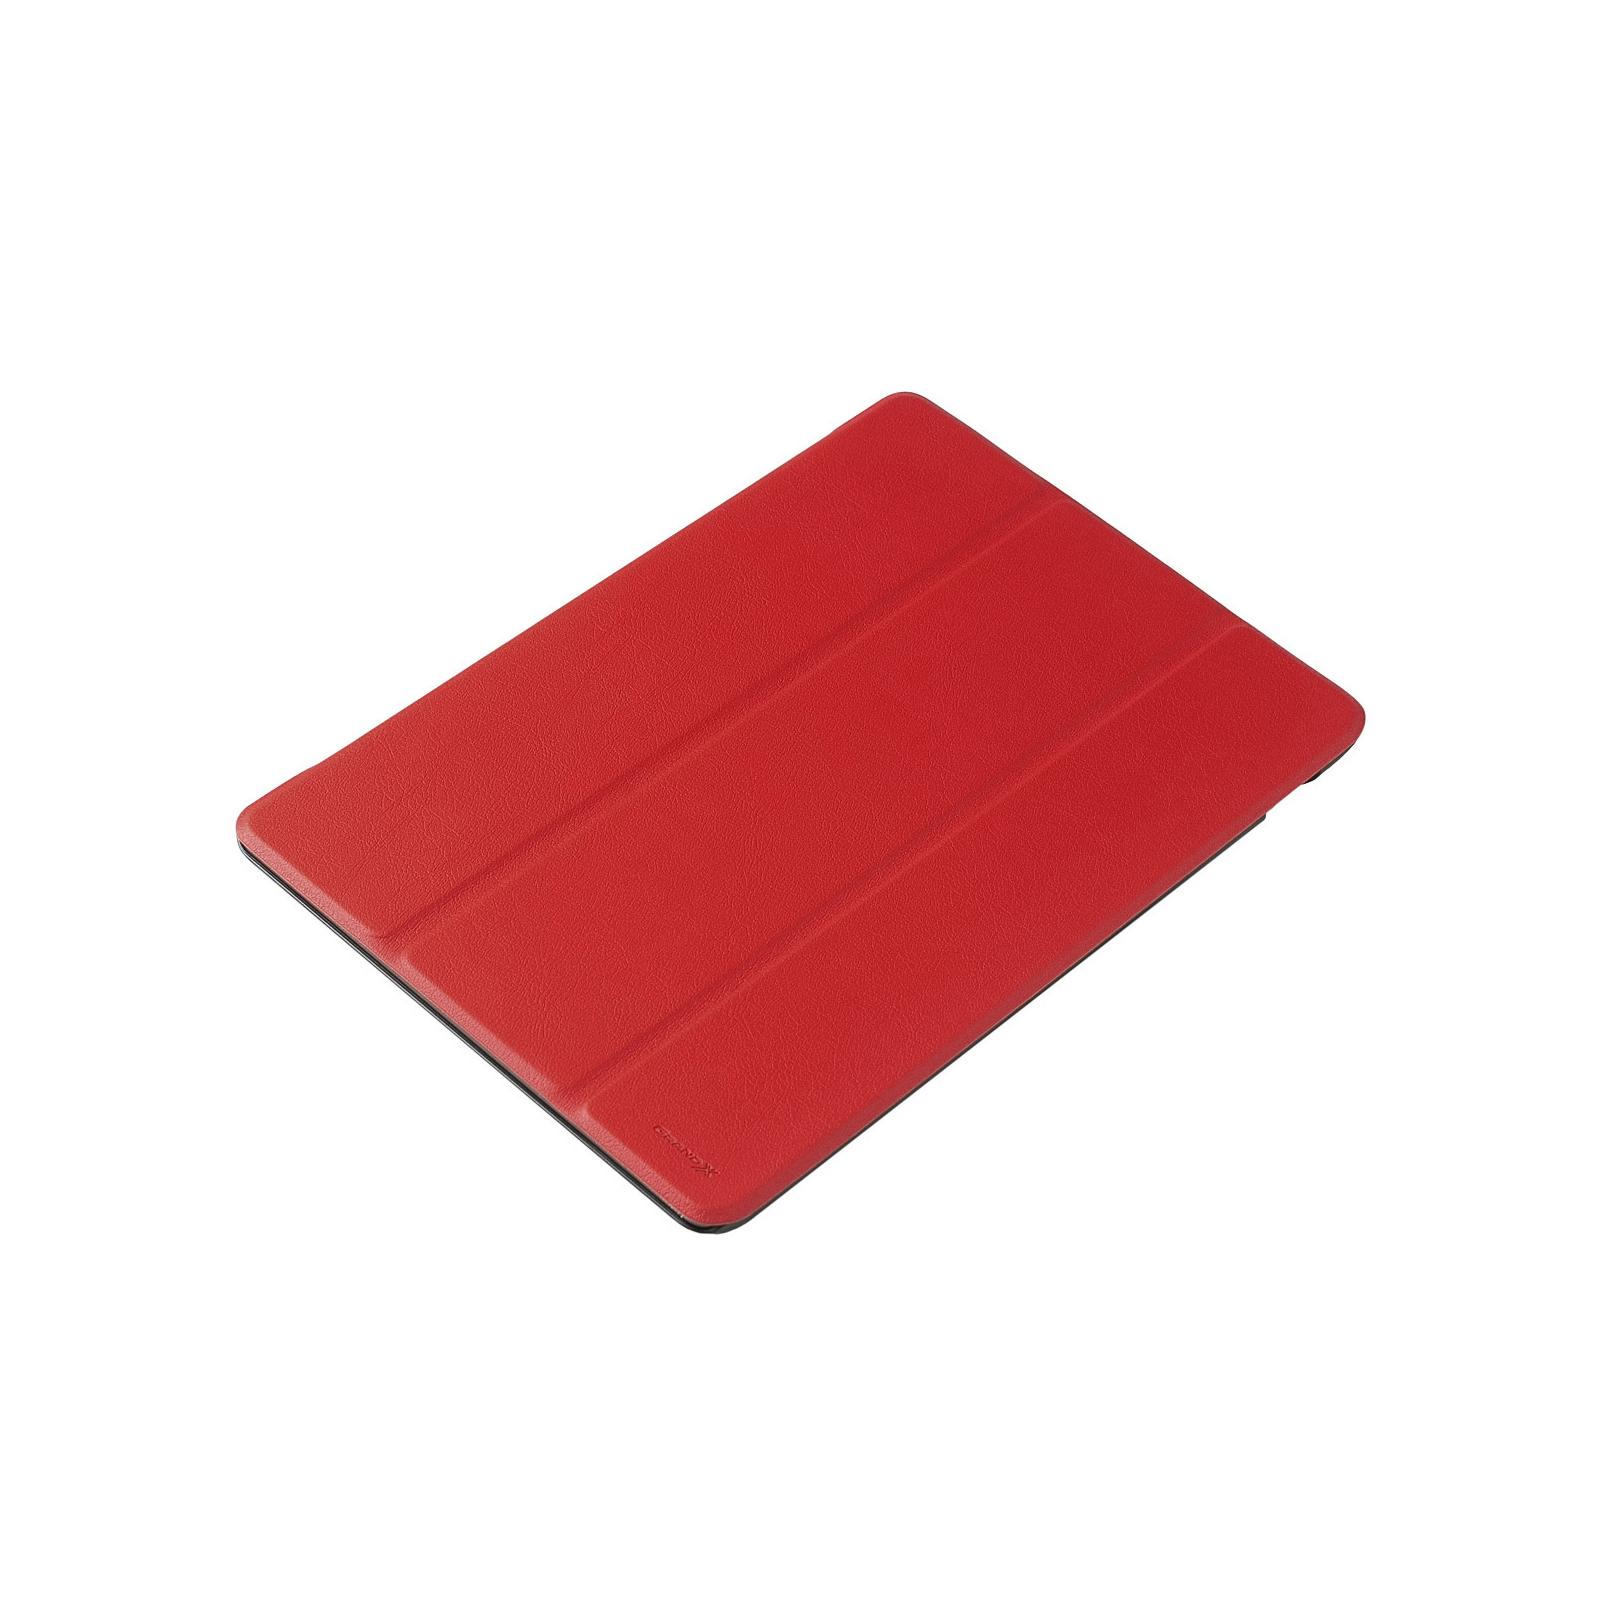 Чехол для планшета Grand-X ASUS ZenPad 10 Z300/Z300C Red (ATC - AZPZ300R) изображение 5